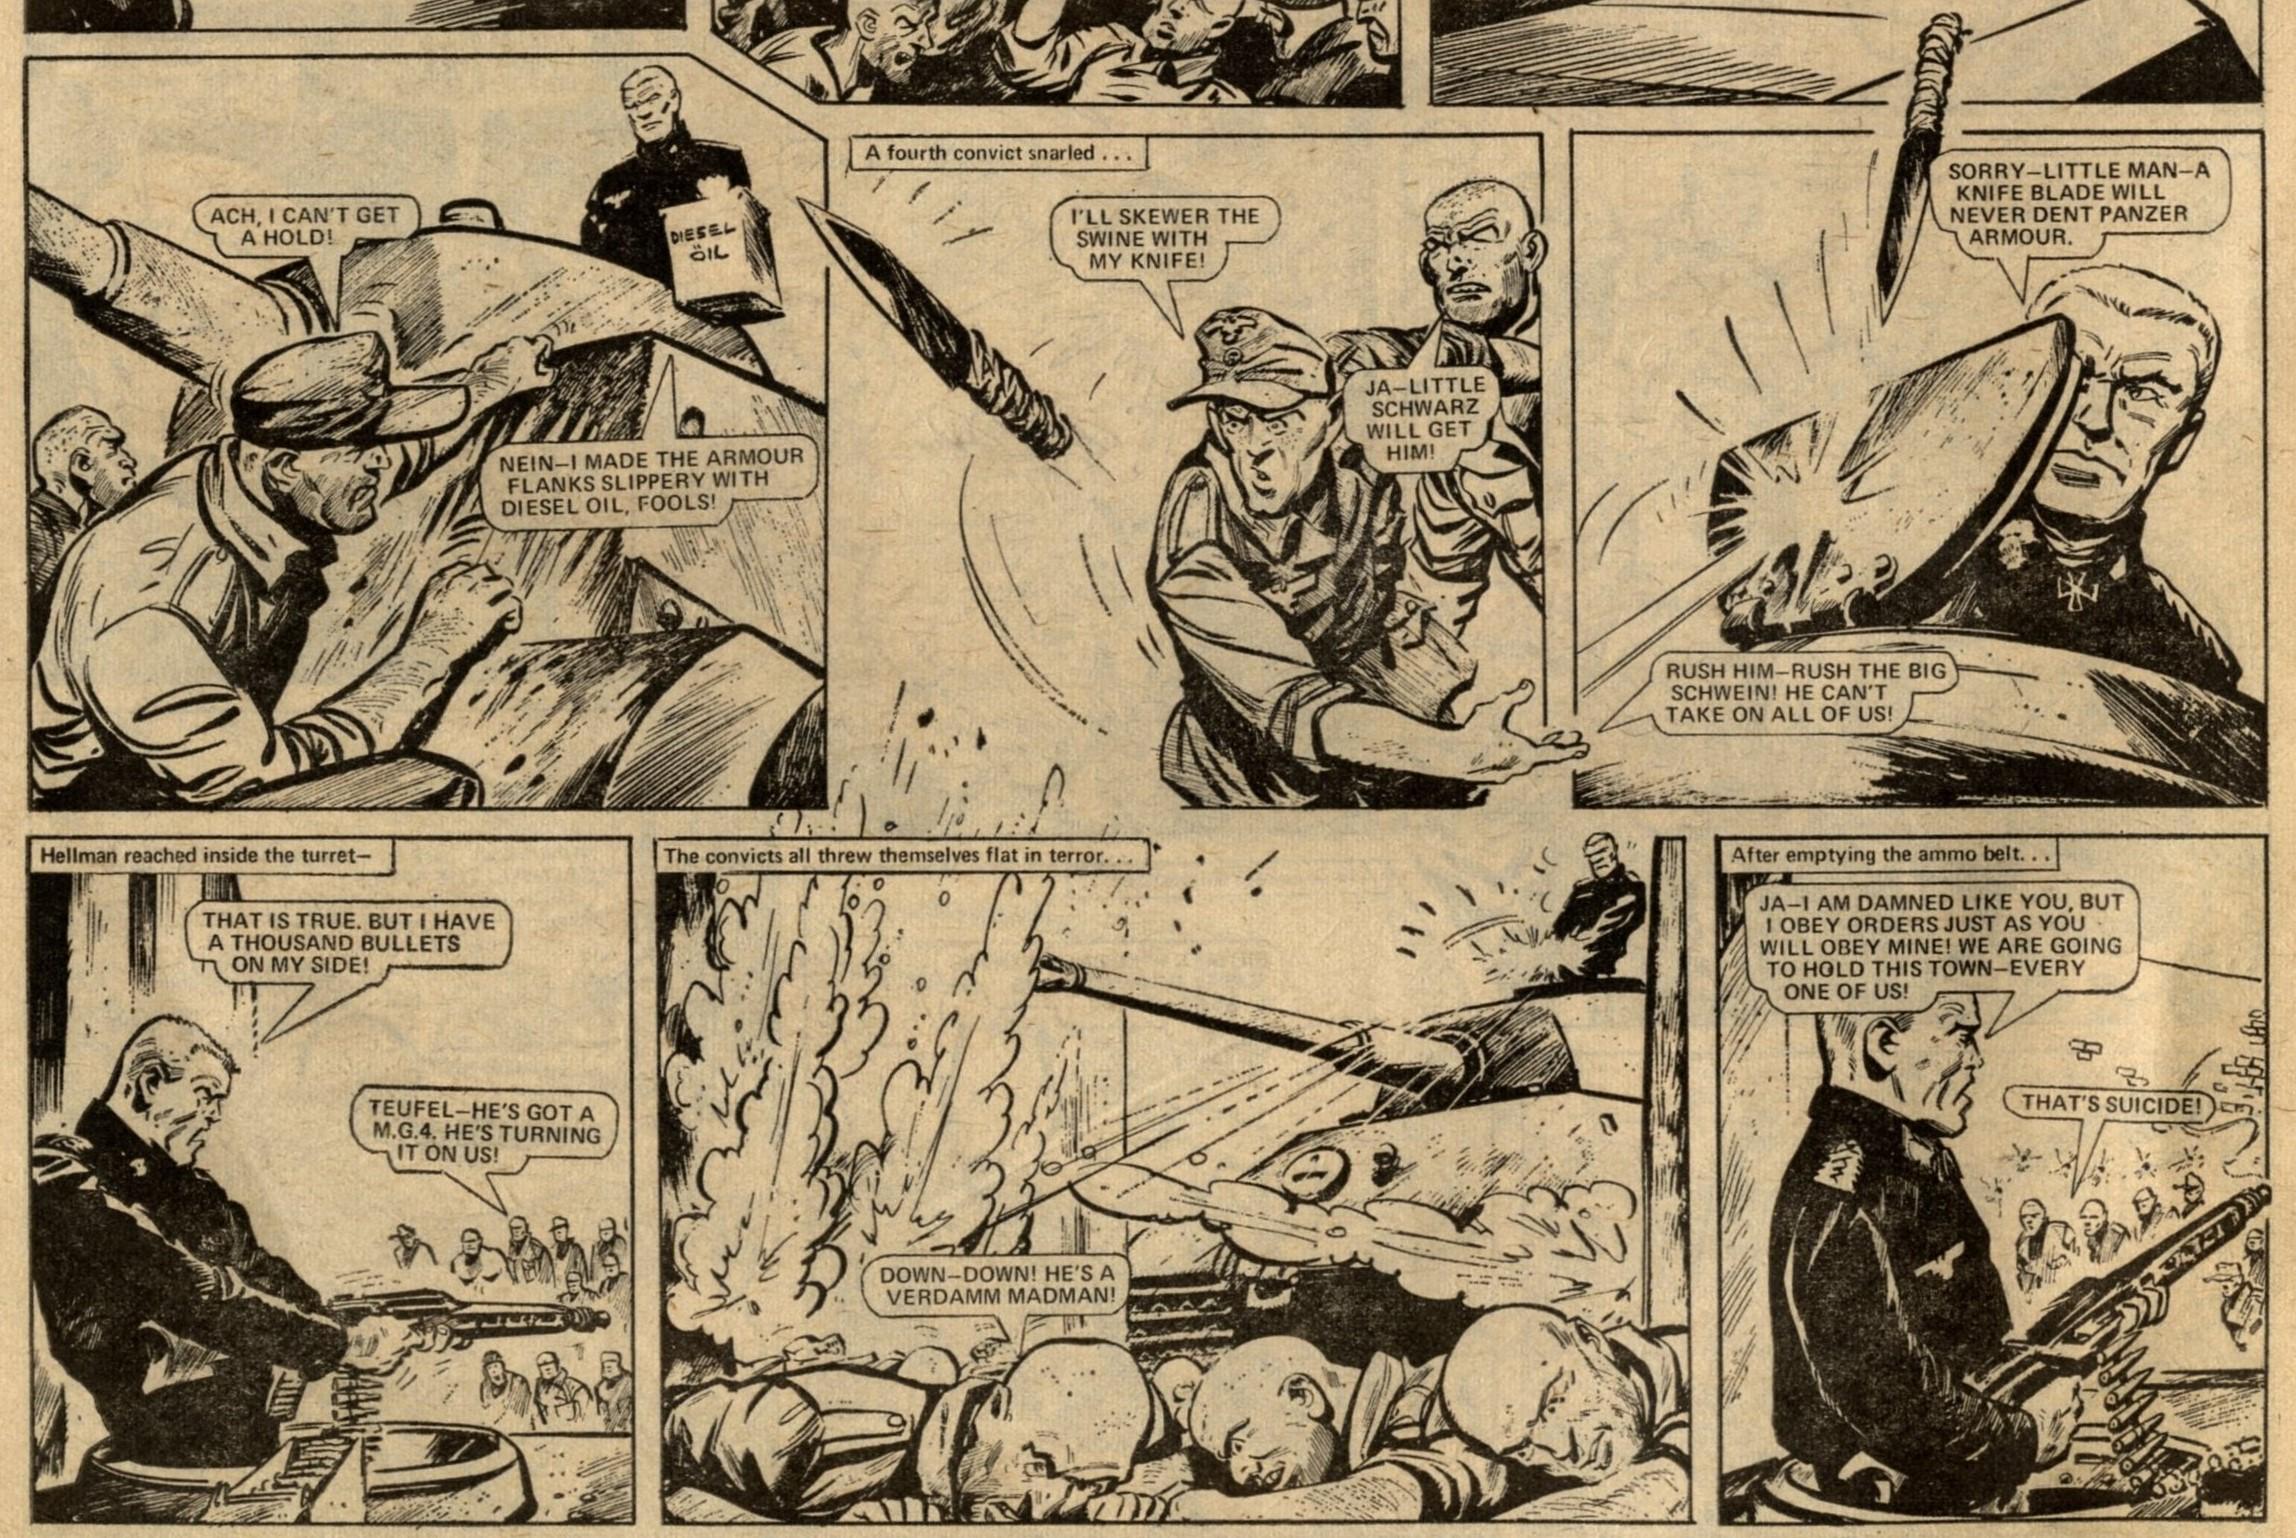 Hellman on the Russian Front: Gerry Finley-Day (writer), Jim Watson? (artist)